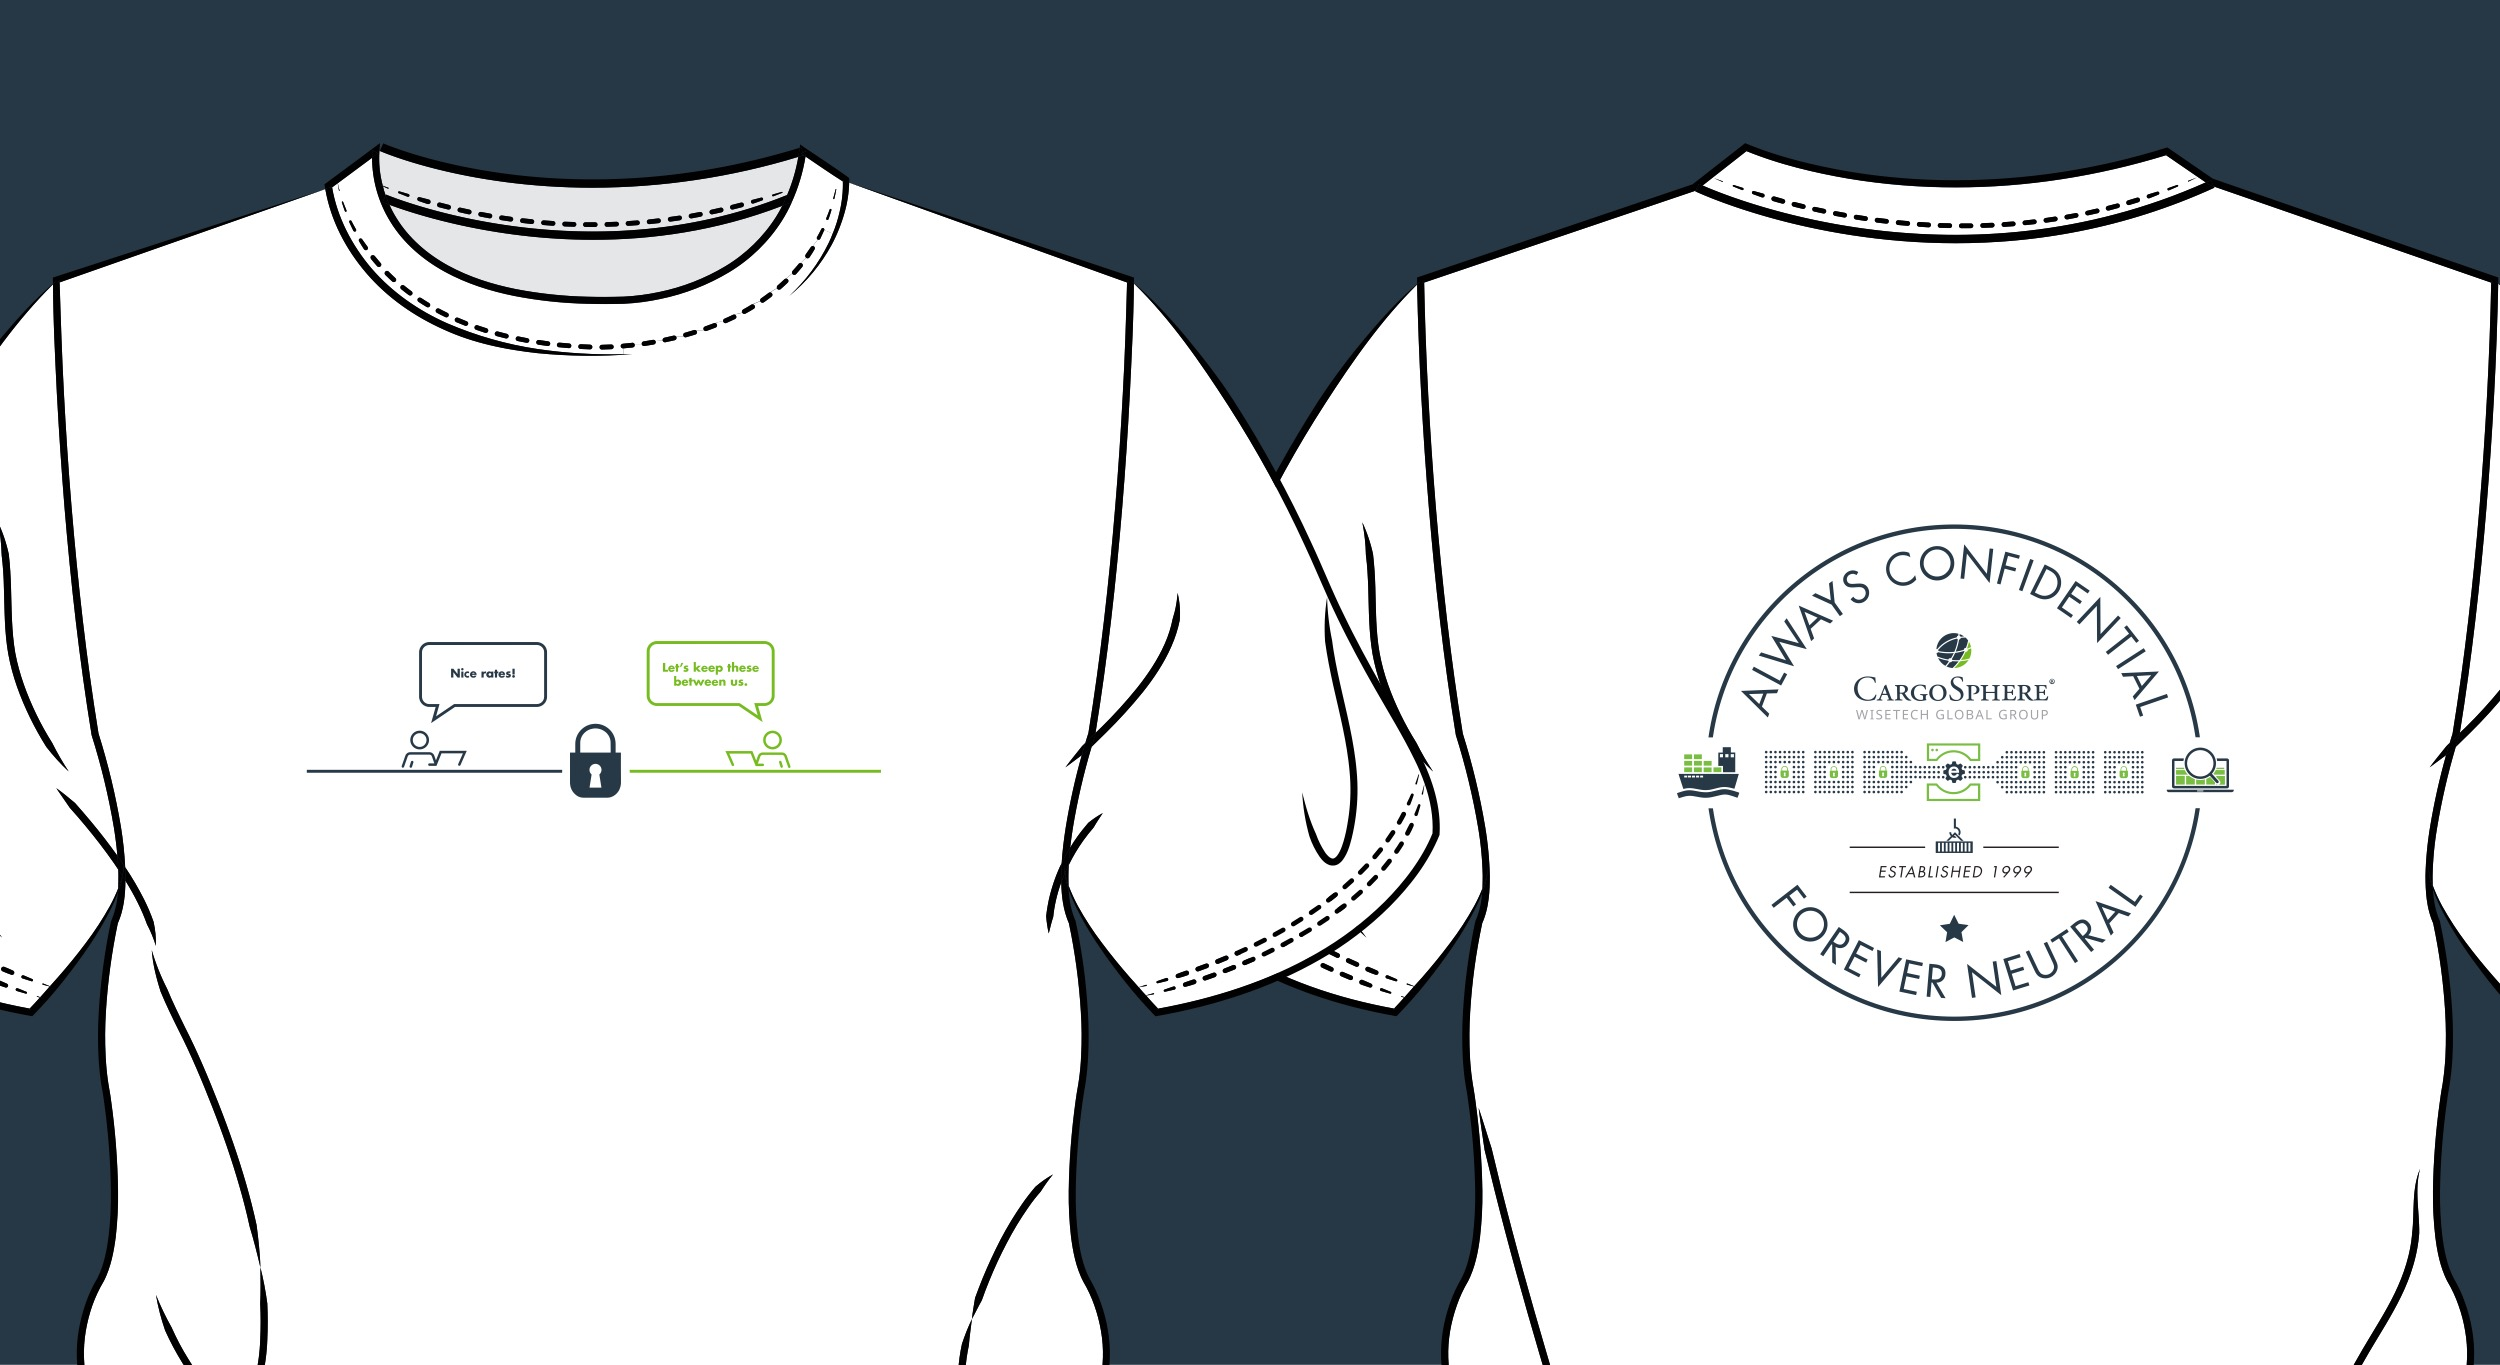 CargoSphere-t-shirts